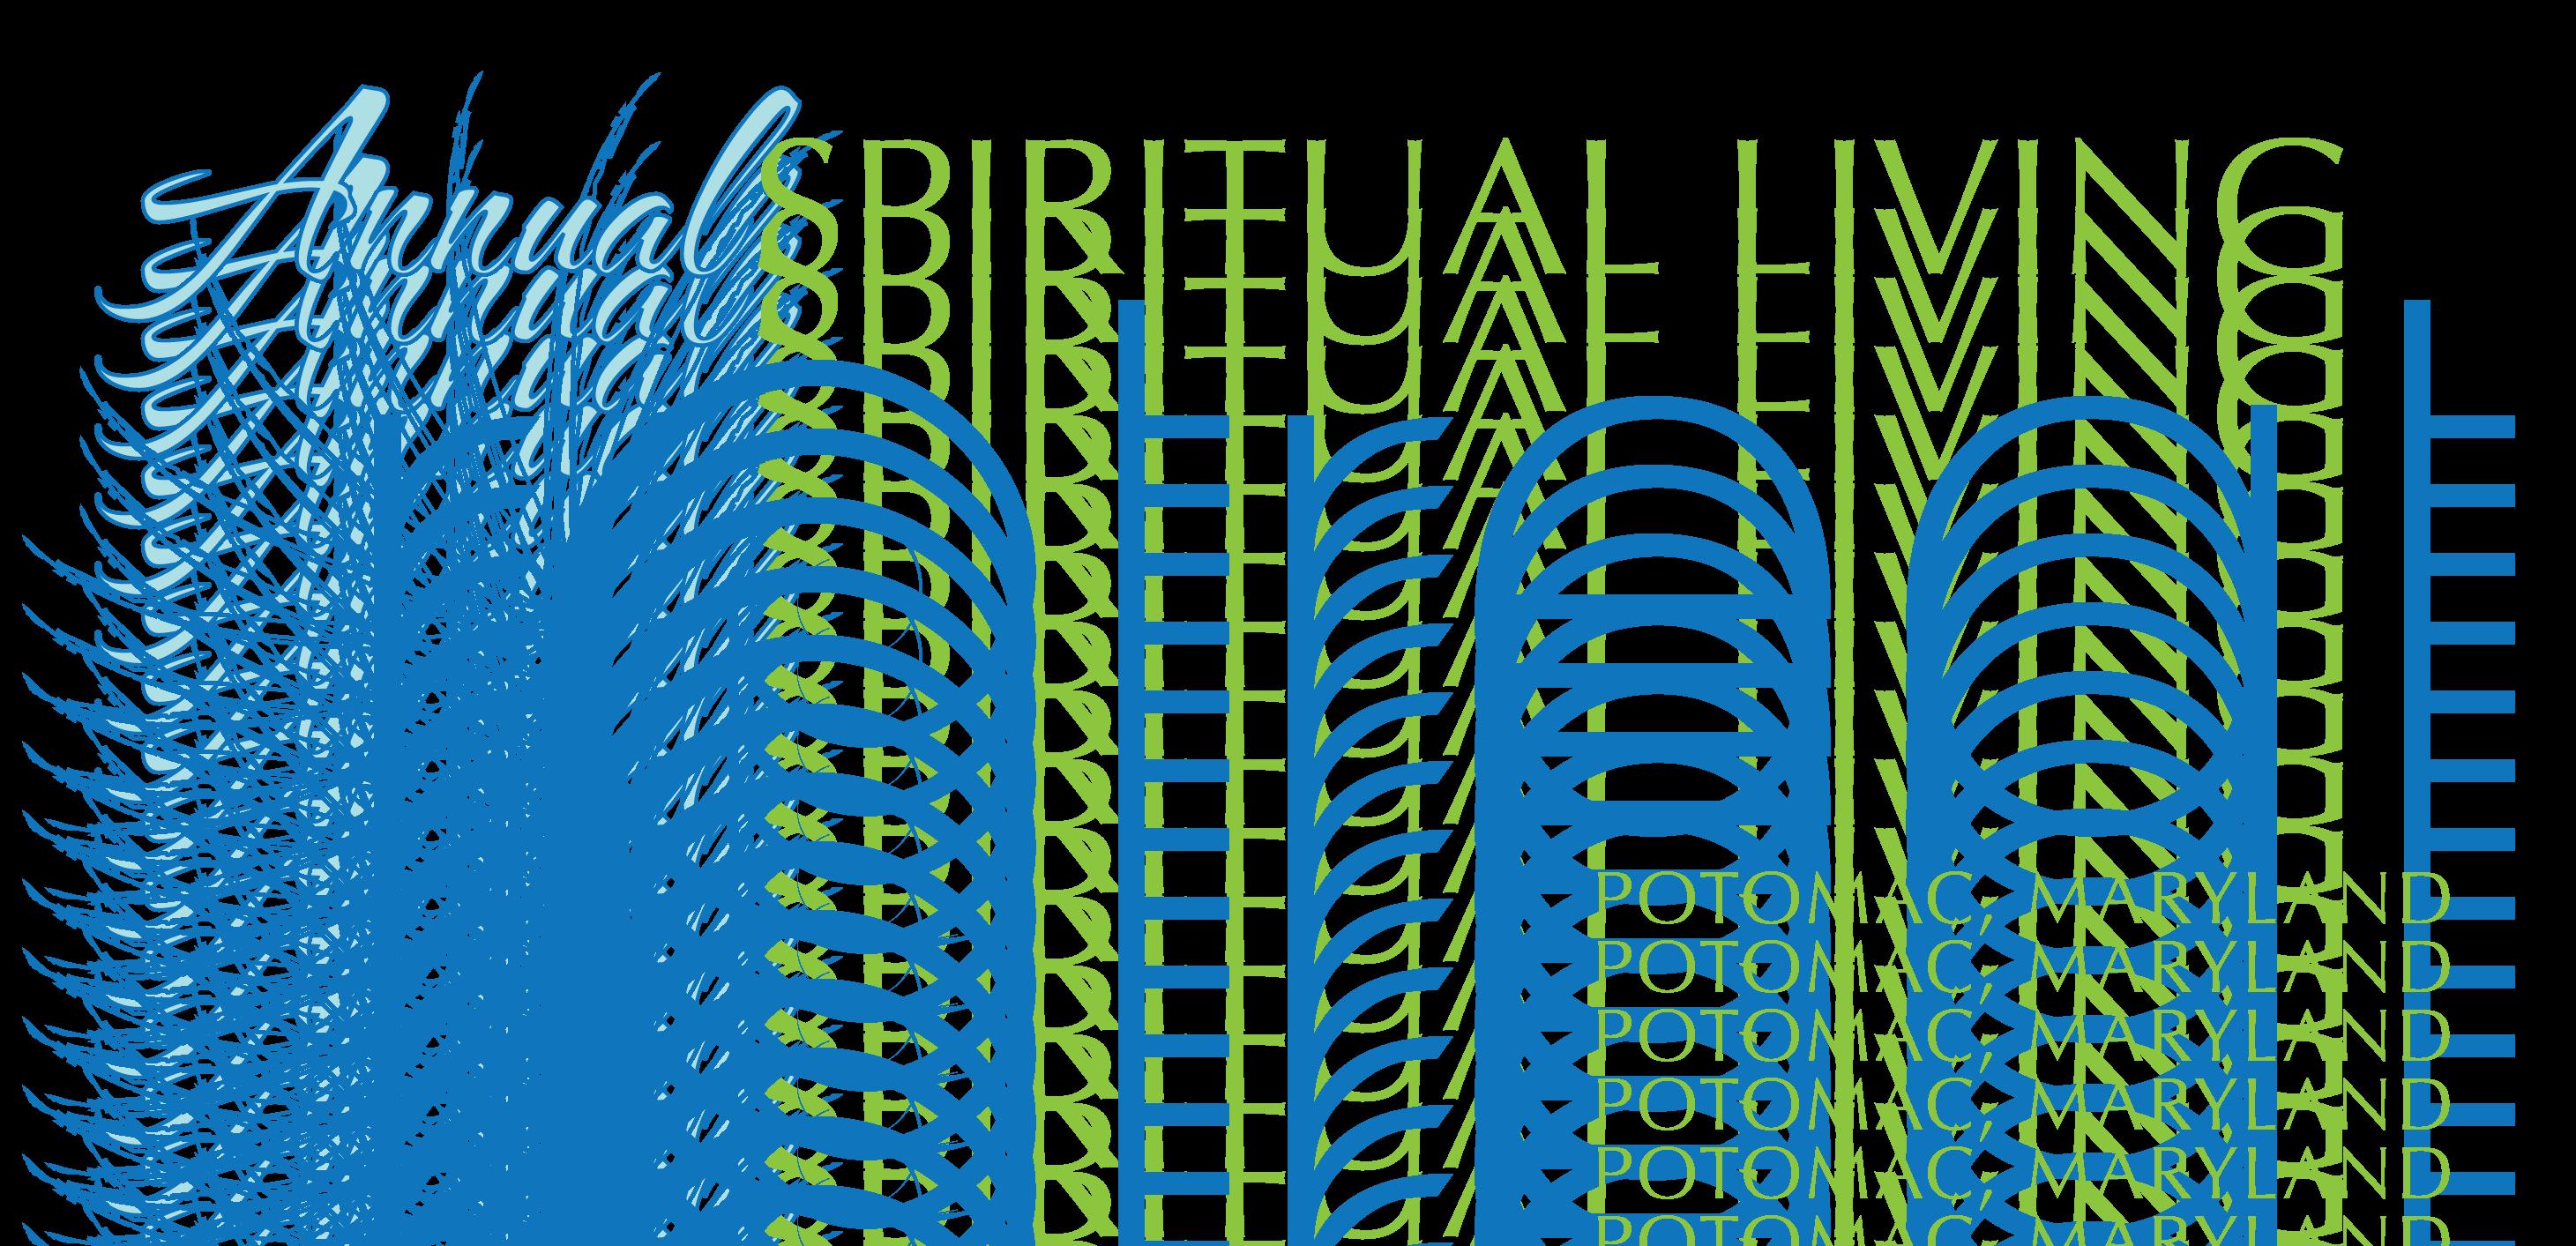 Spiritual Living Retreat Logo 040515